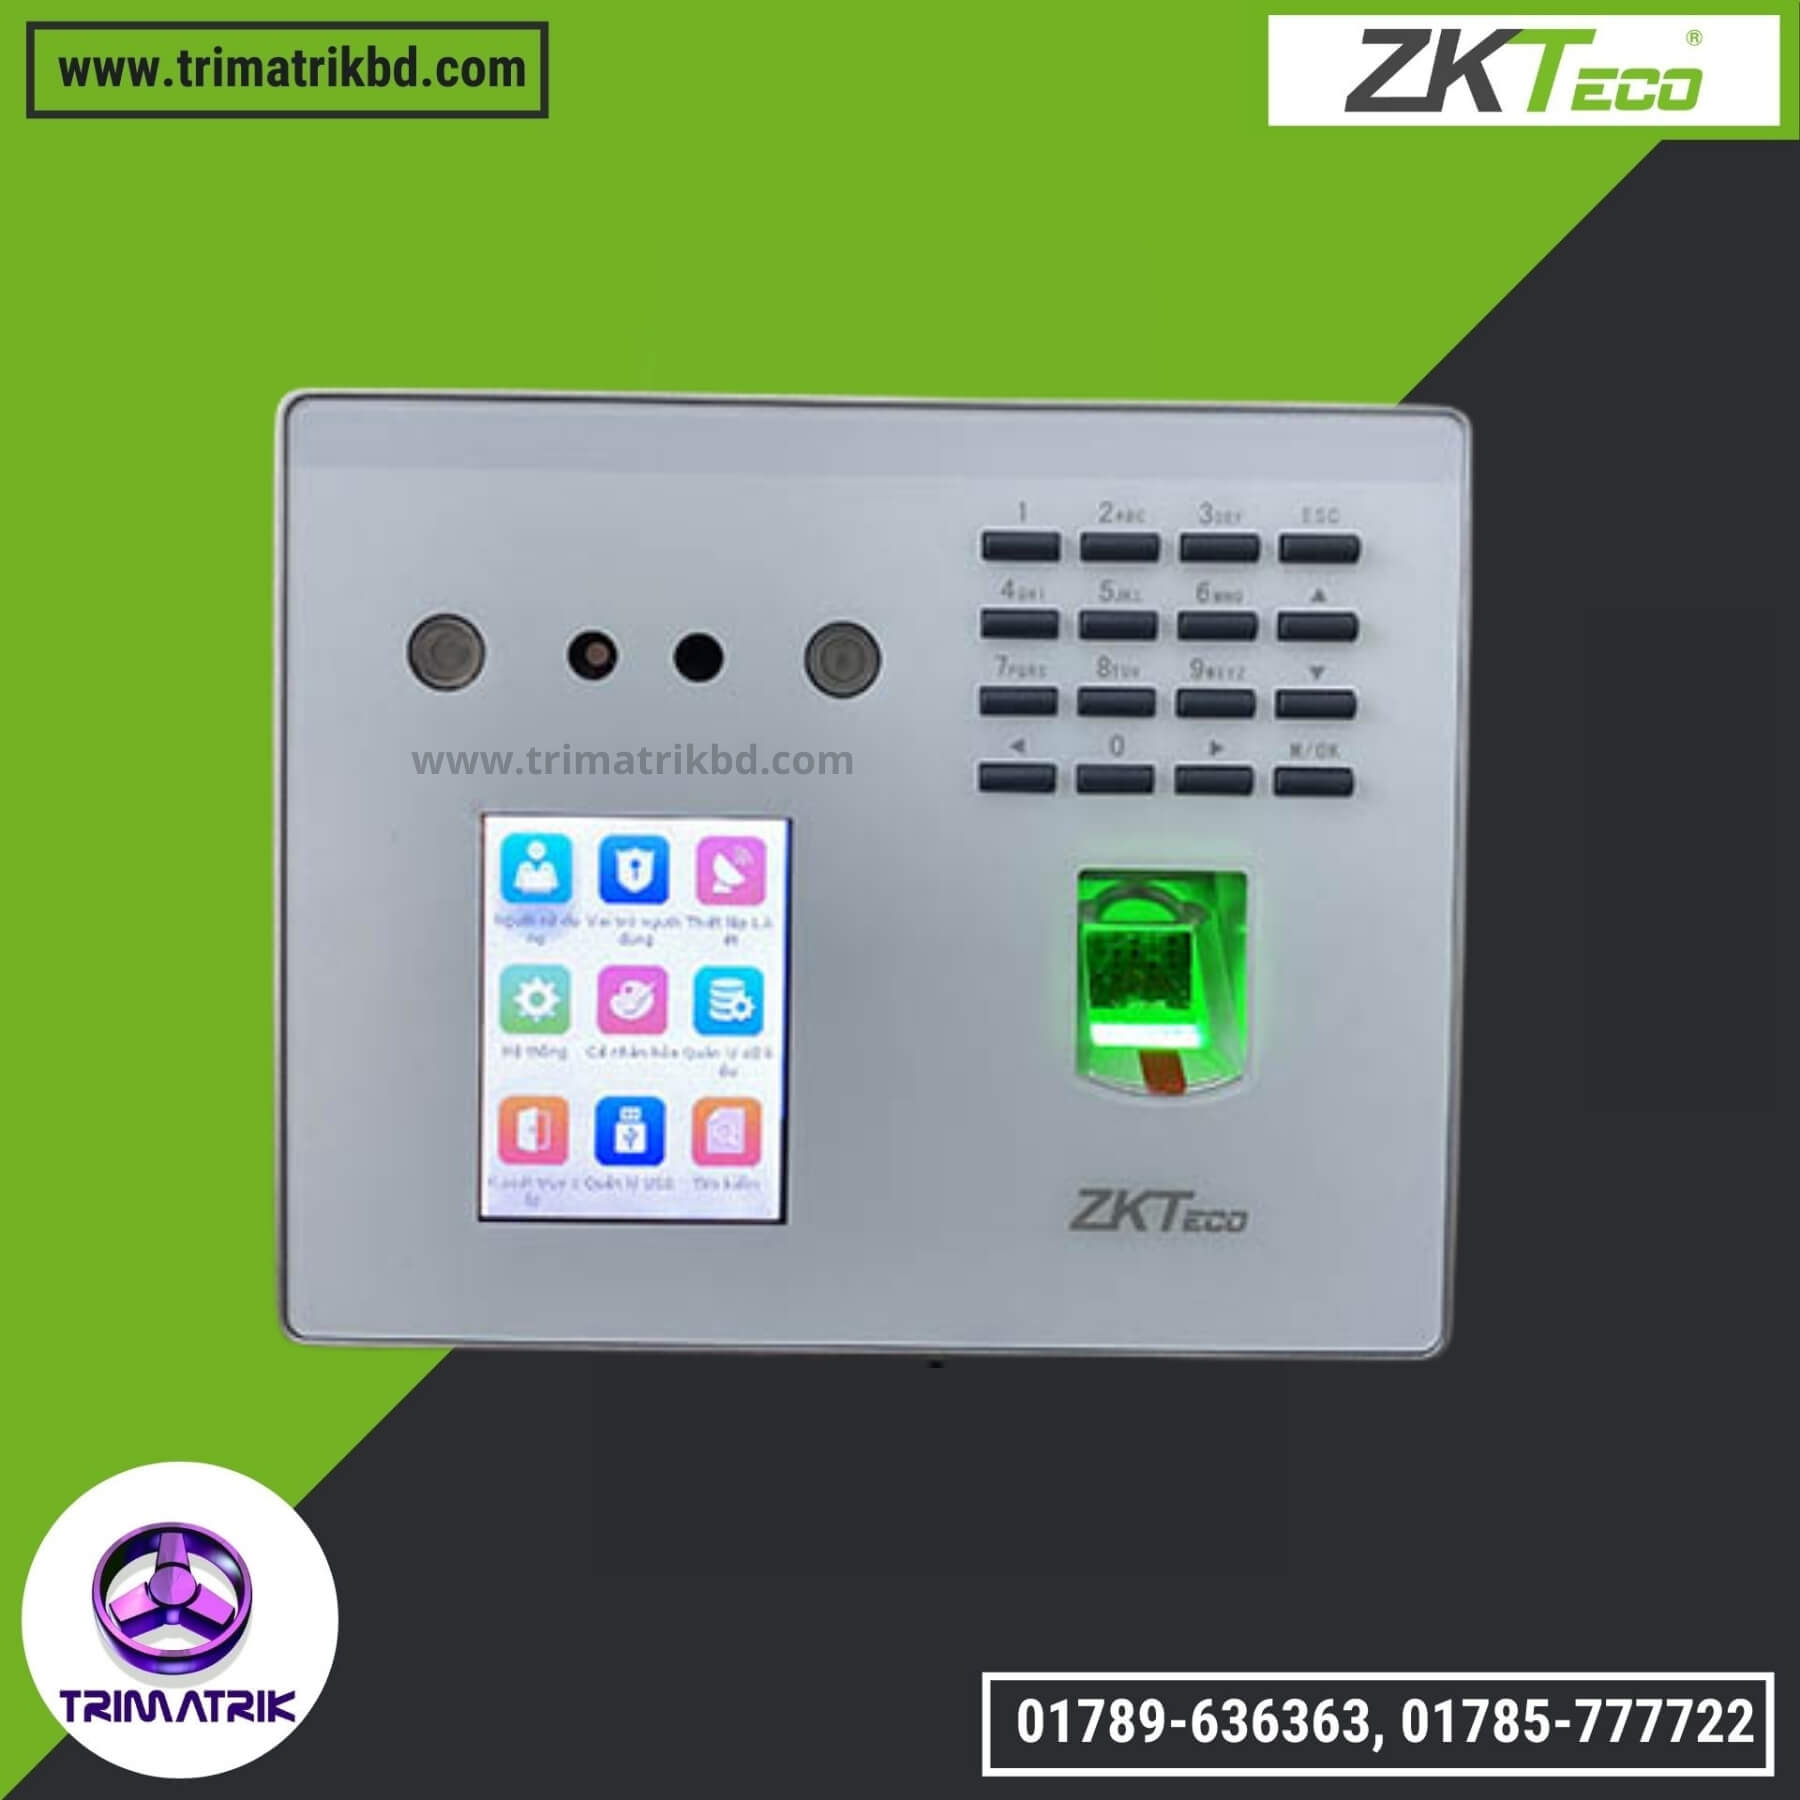 ZKTeco MB560-VL Face Recognition+Fingerprint Attendance Best Price in Bangladesh